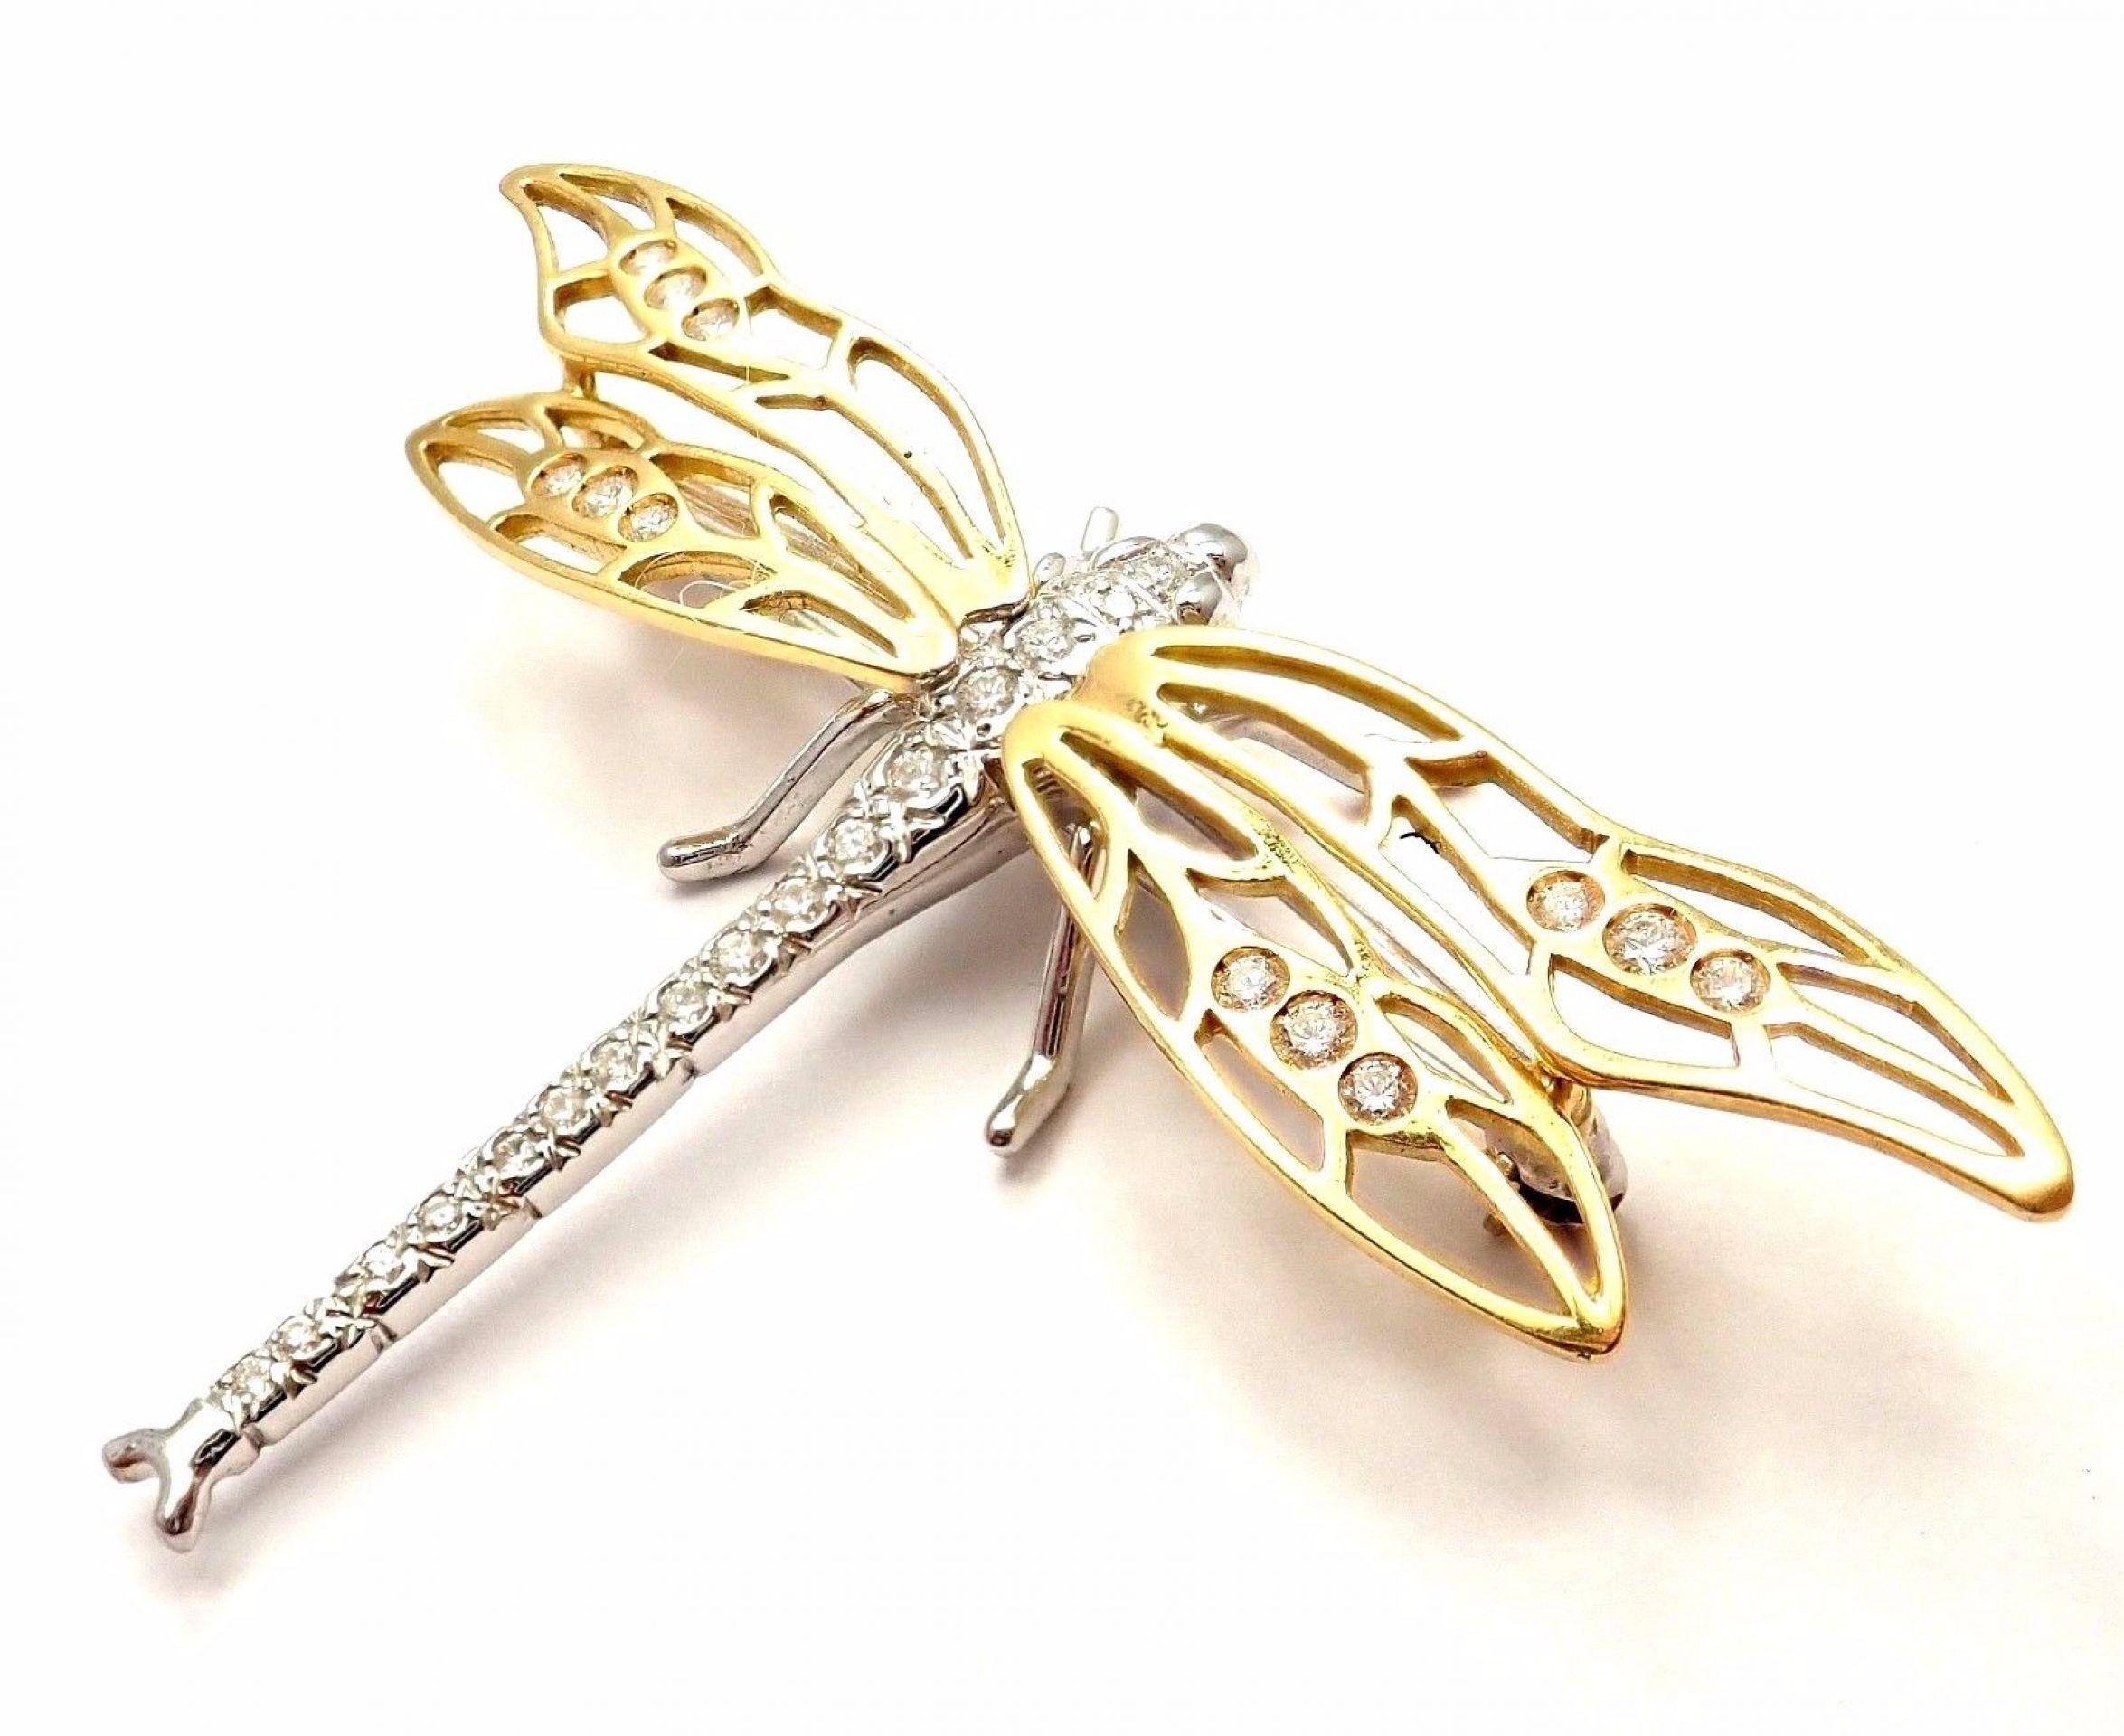 Vintage Henry Dankner 18k Yellow White Gold Diamond Dragonfly Pin Brooch